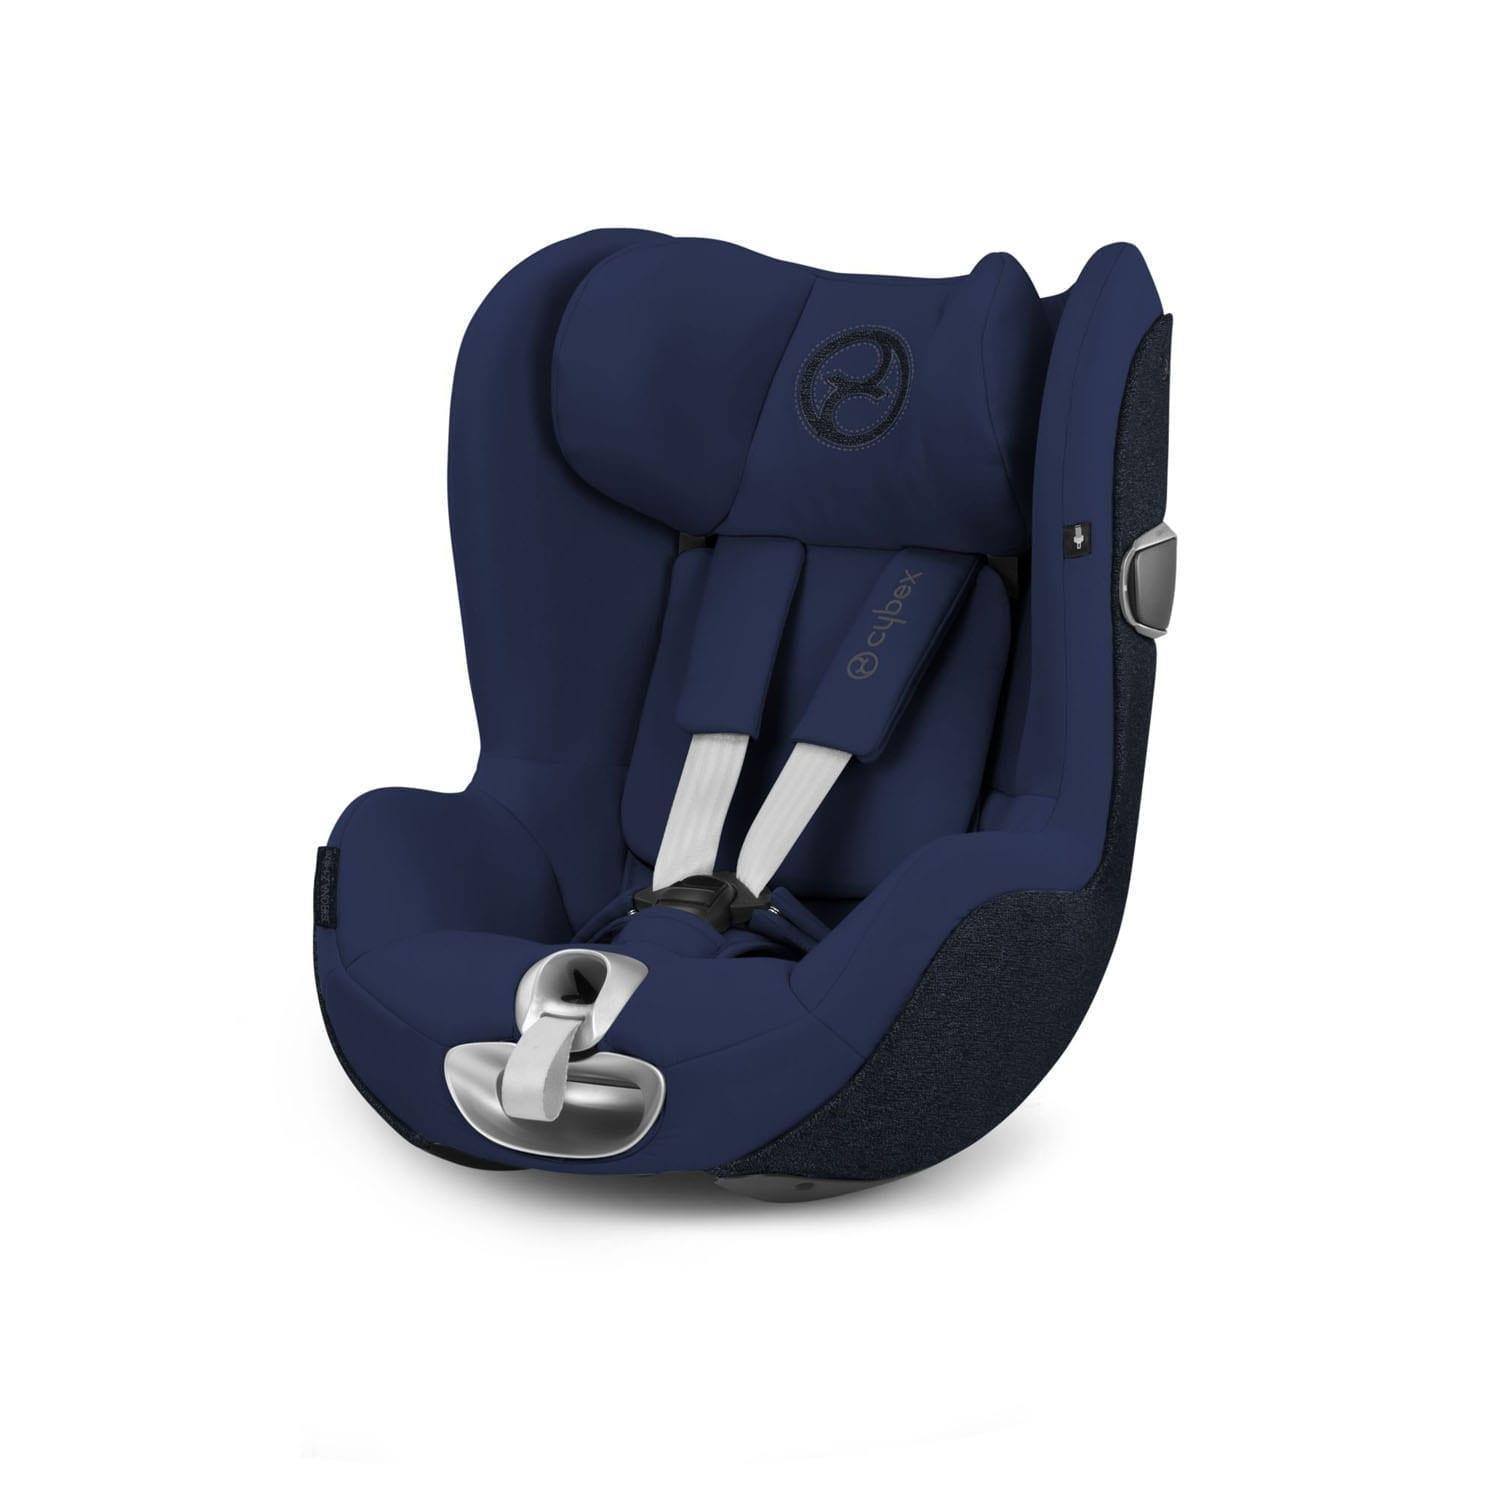 Cybex Sirona Z i-Size Car Seat Midnight Blue/Navy Blue